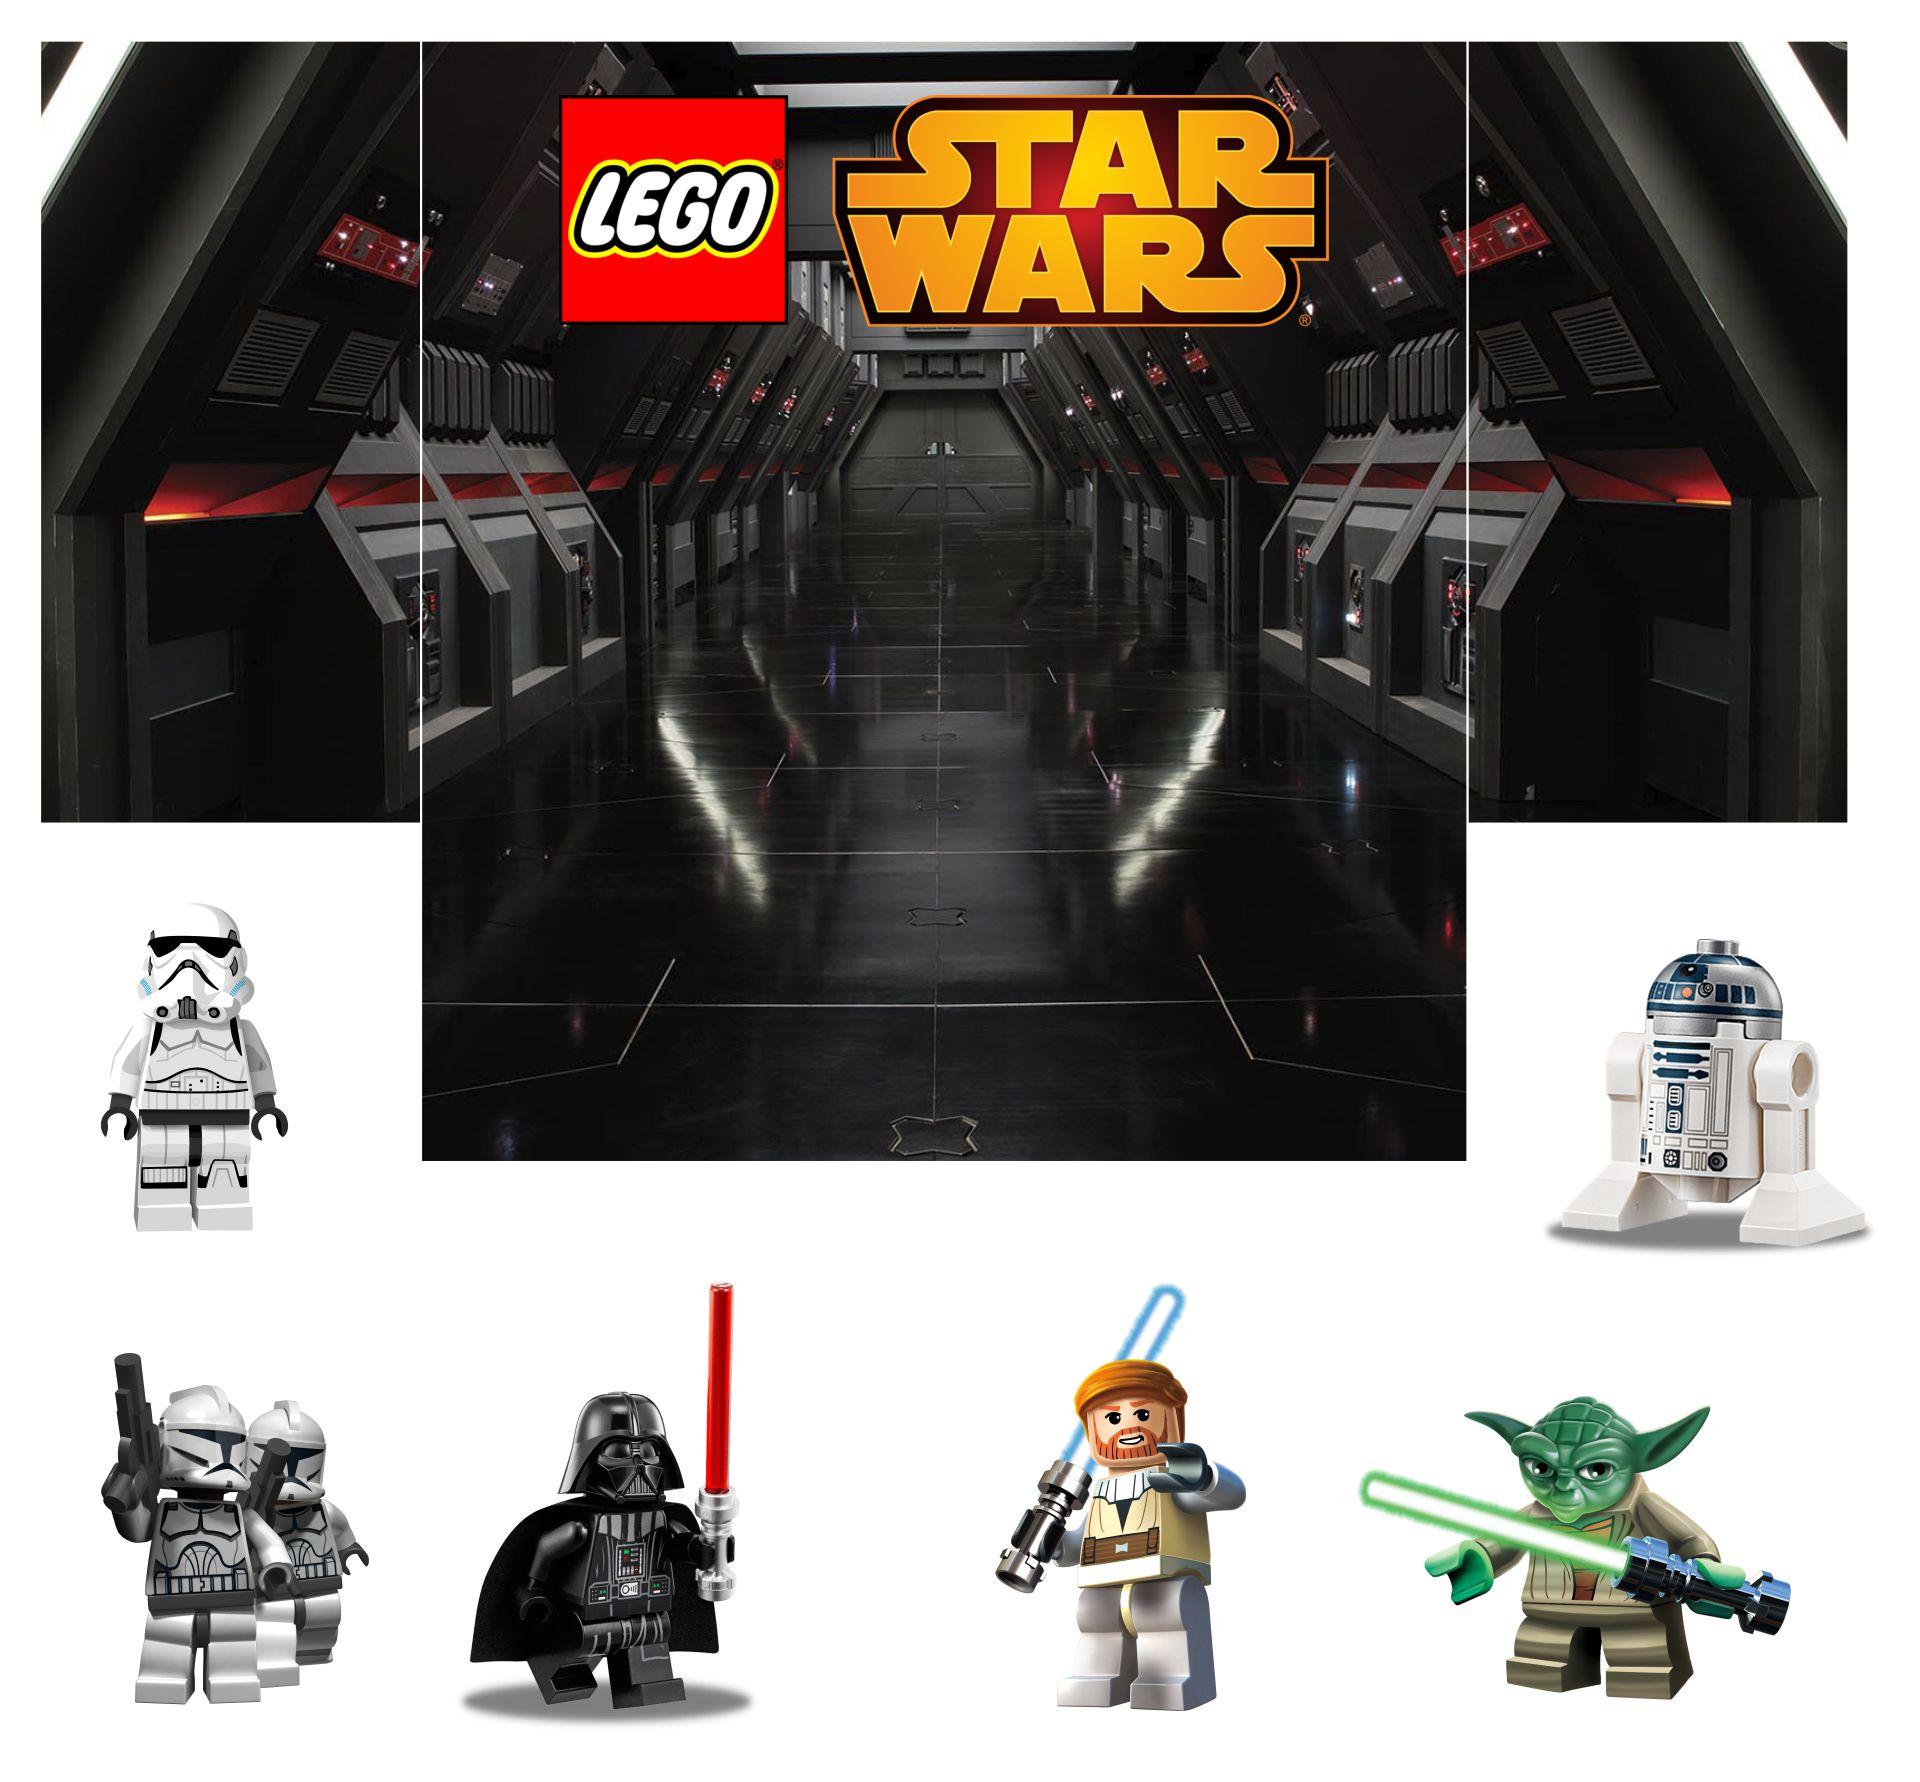 LEGO Star Wars Diorama Backgrounds